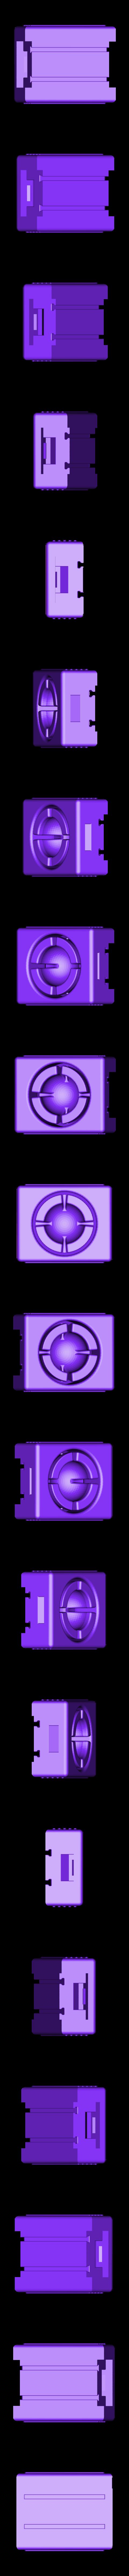 bottom.STL Download free STL file 1/4-20 Adapter for Articulating Camera Mount for Prusa MK3 • 3D printable model, sneaks